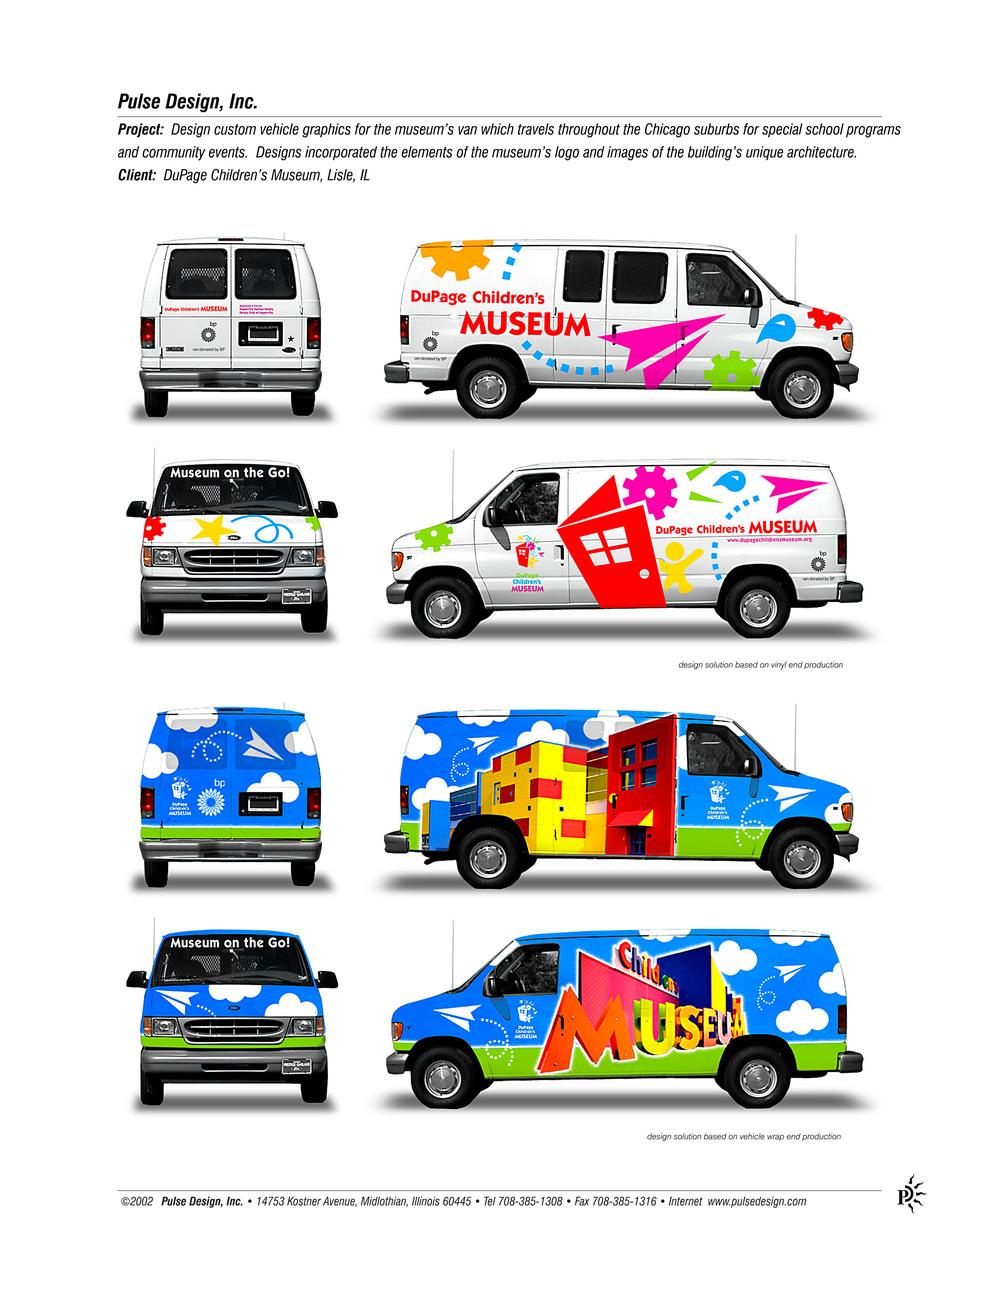 DCM-Van-Wrap-Pulse-Design-Inc.jpg